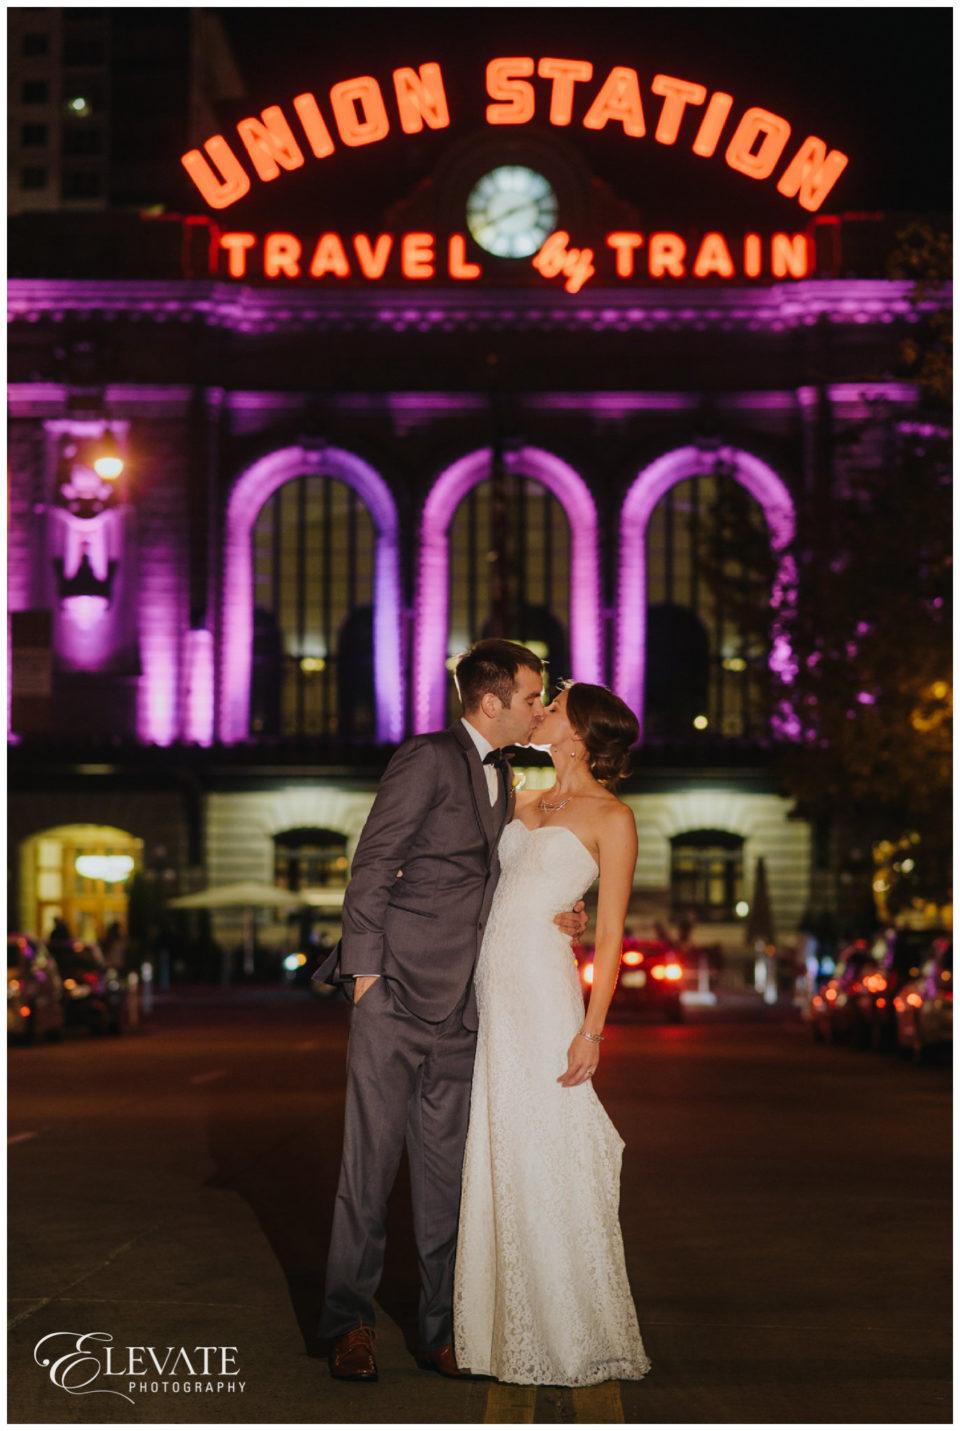 night wedding portrait union station